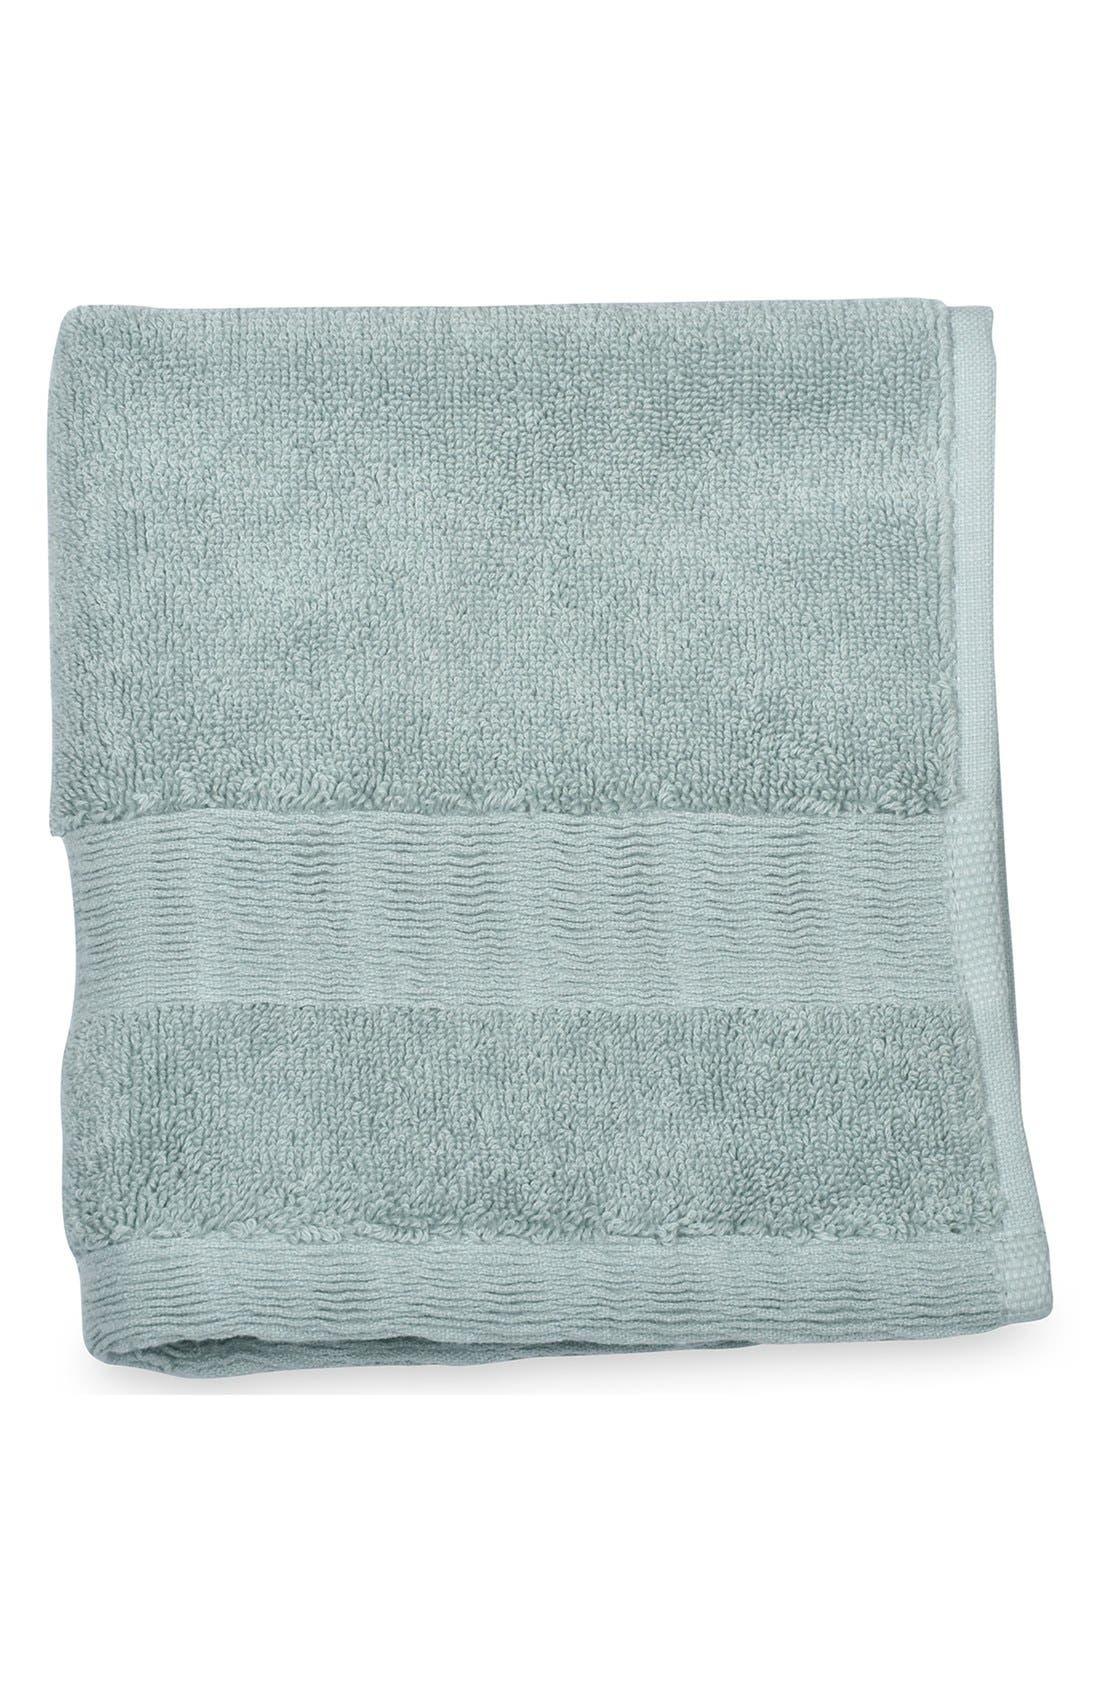 Mercer Wash Towel,                             Main thumbnail 1, color,                             Mist